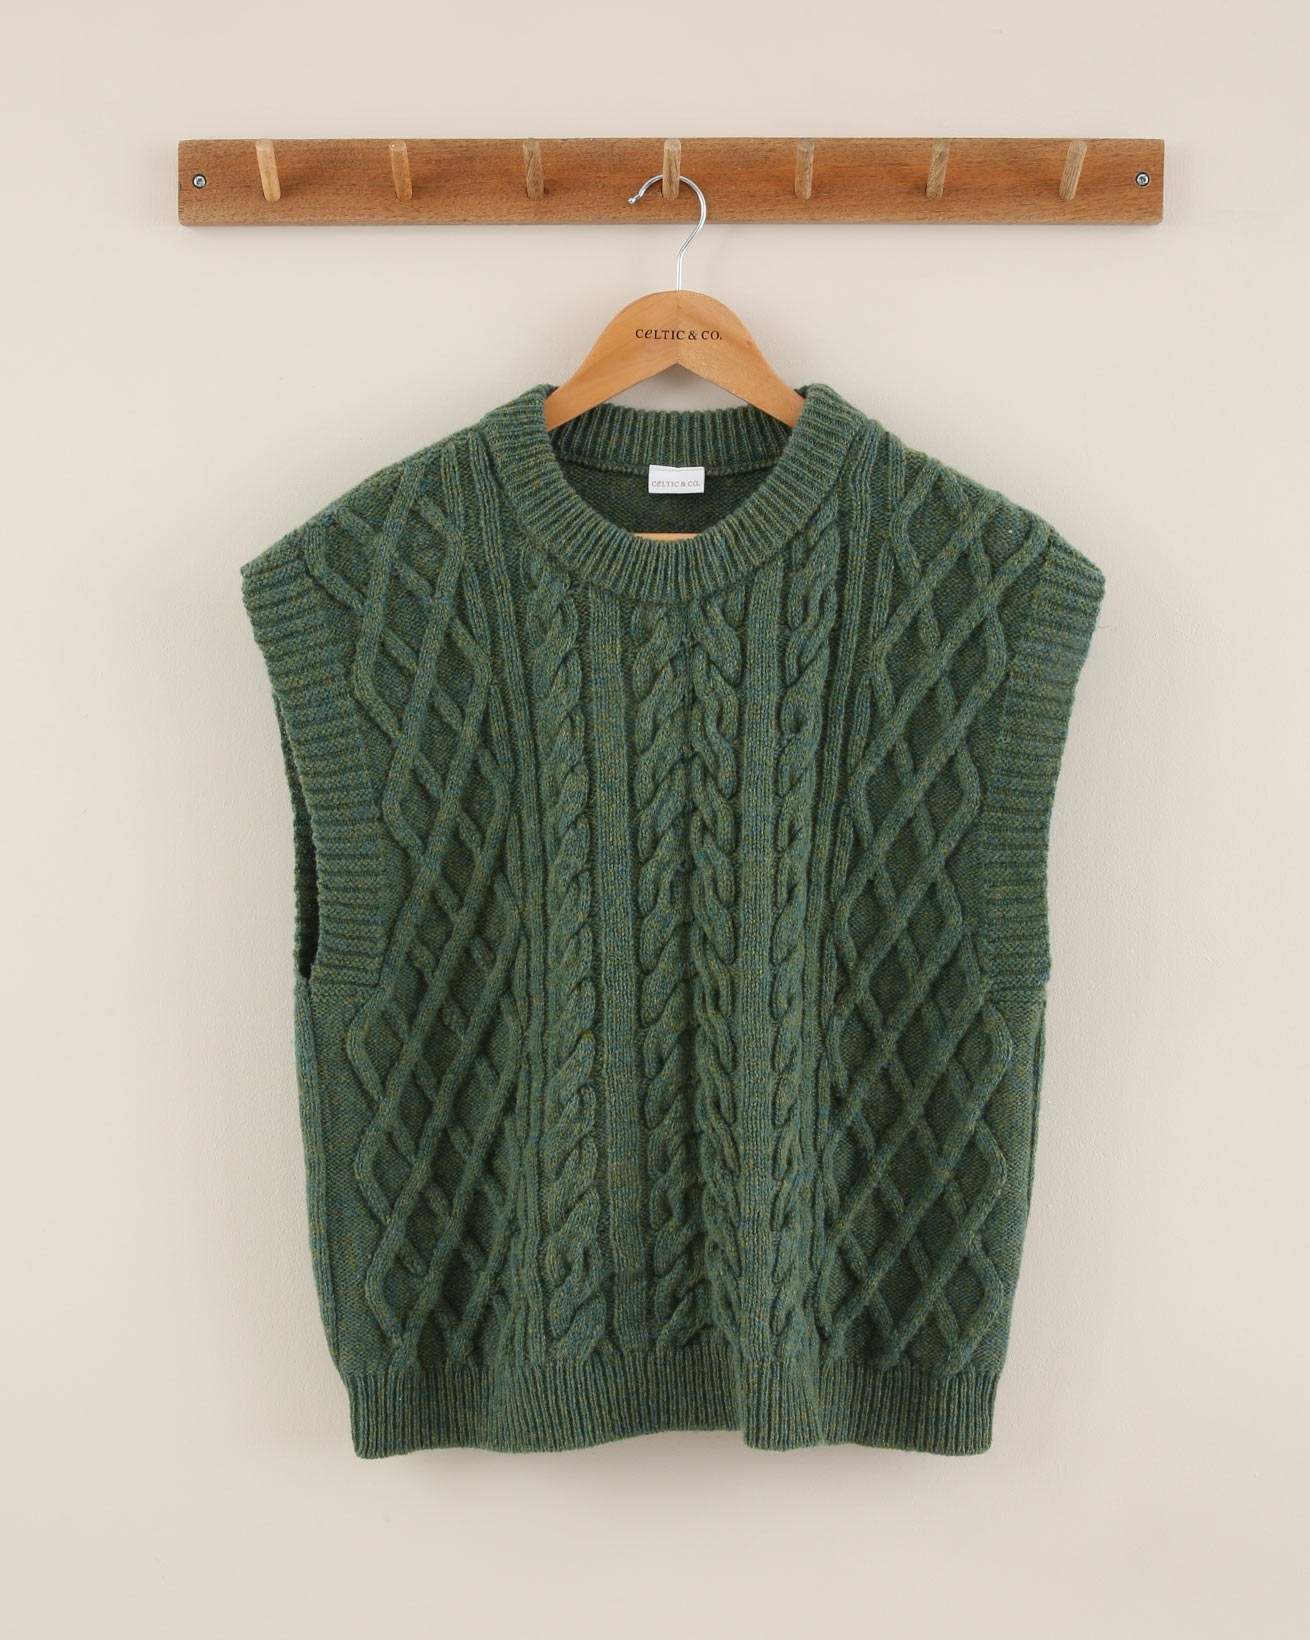 Sleeveless Cable Knit Vest - Size Medium - Green Mix - 1916